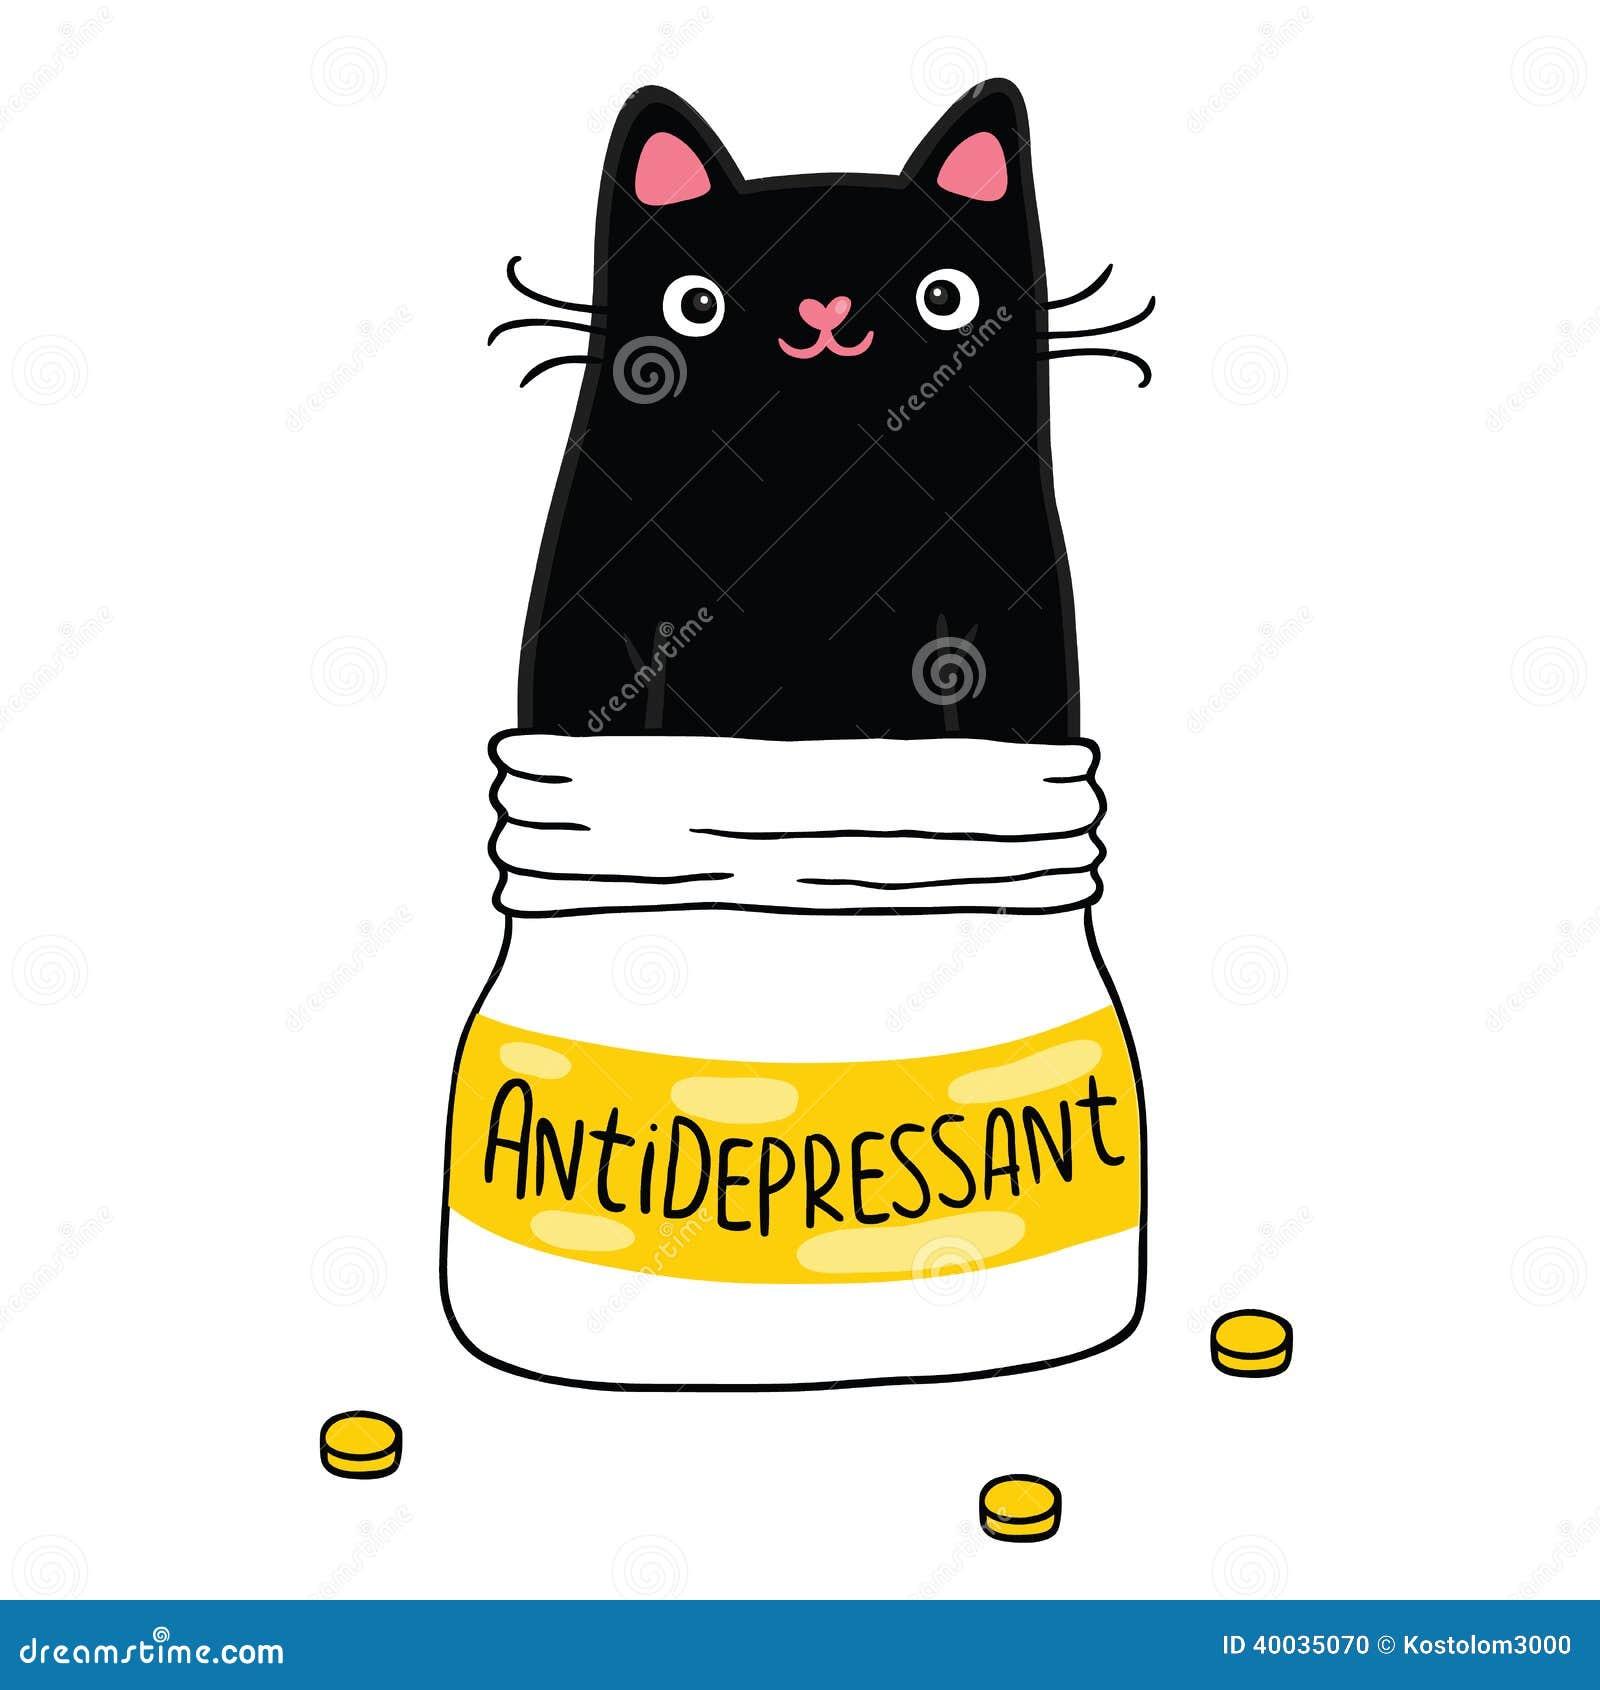 Antidepressant Stock Illustrations – 818 Antidepressant ...